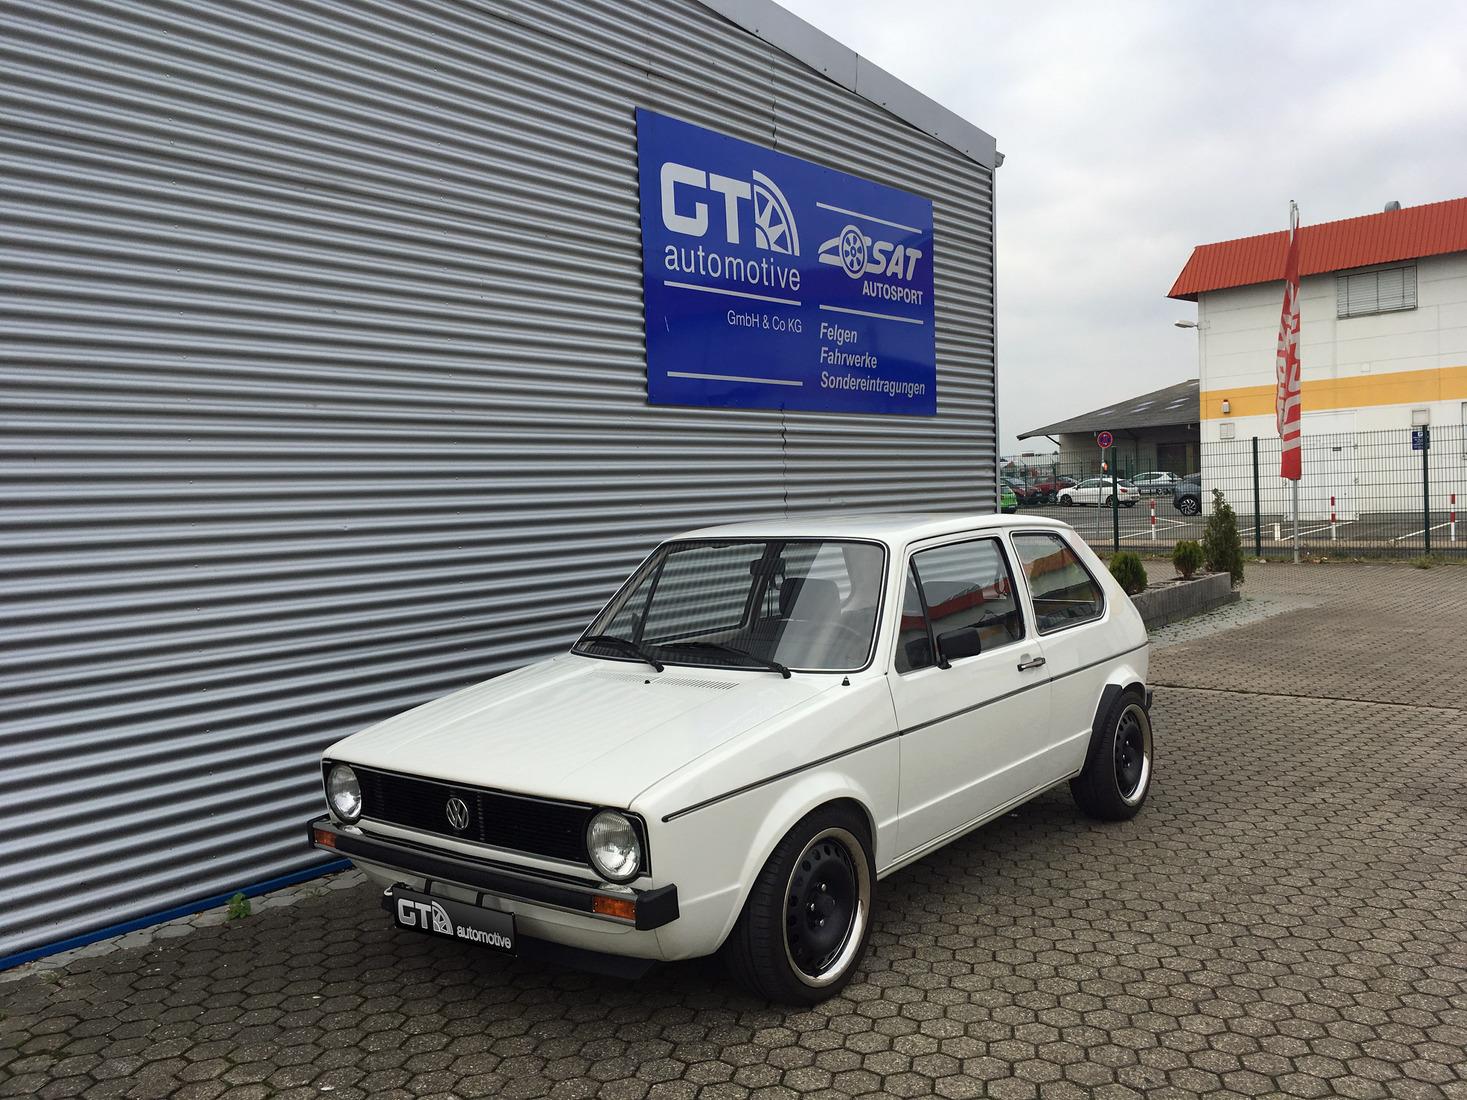 Sonderabnahme Vw Golf 1 Typ 17 Motorumbau Vr6 Turbo Auf 169kw Gt